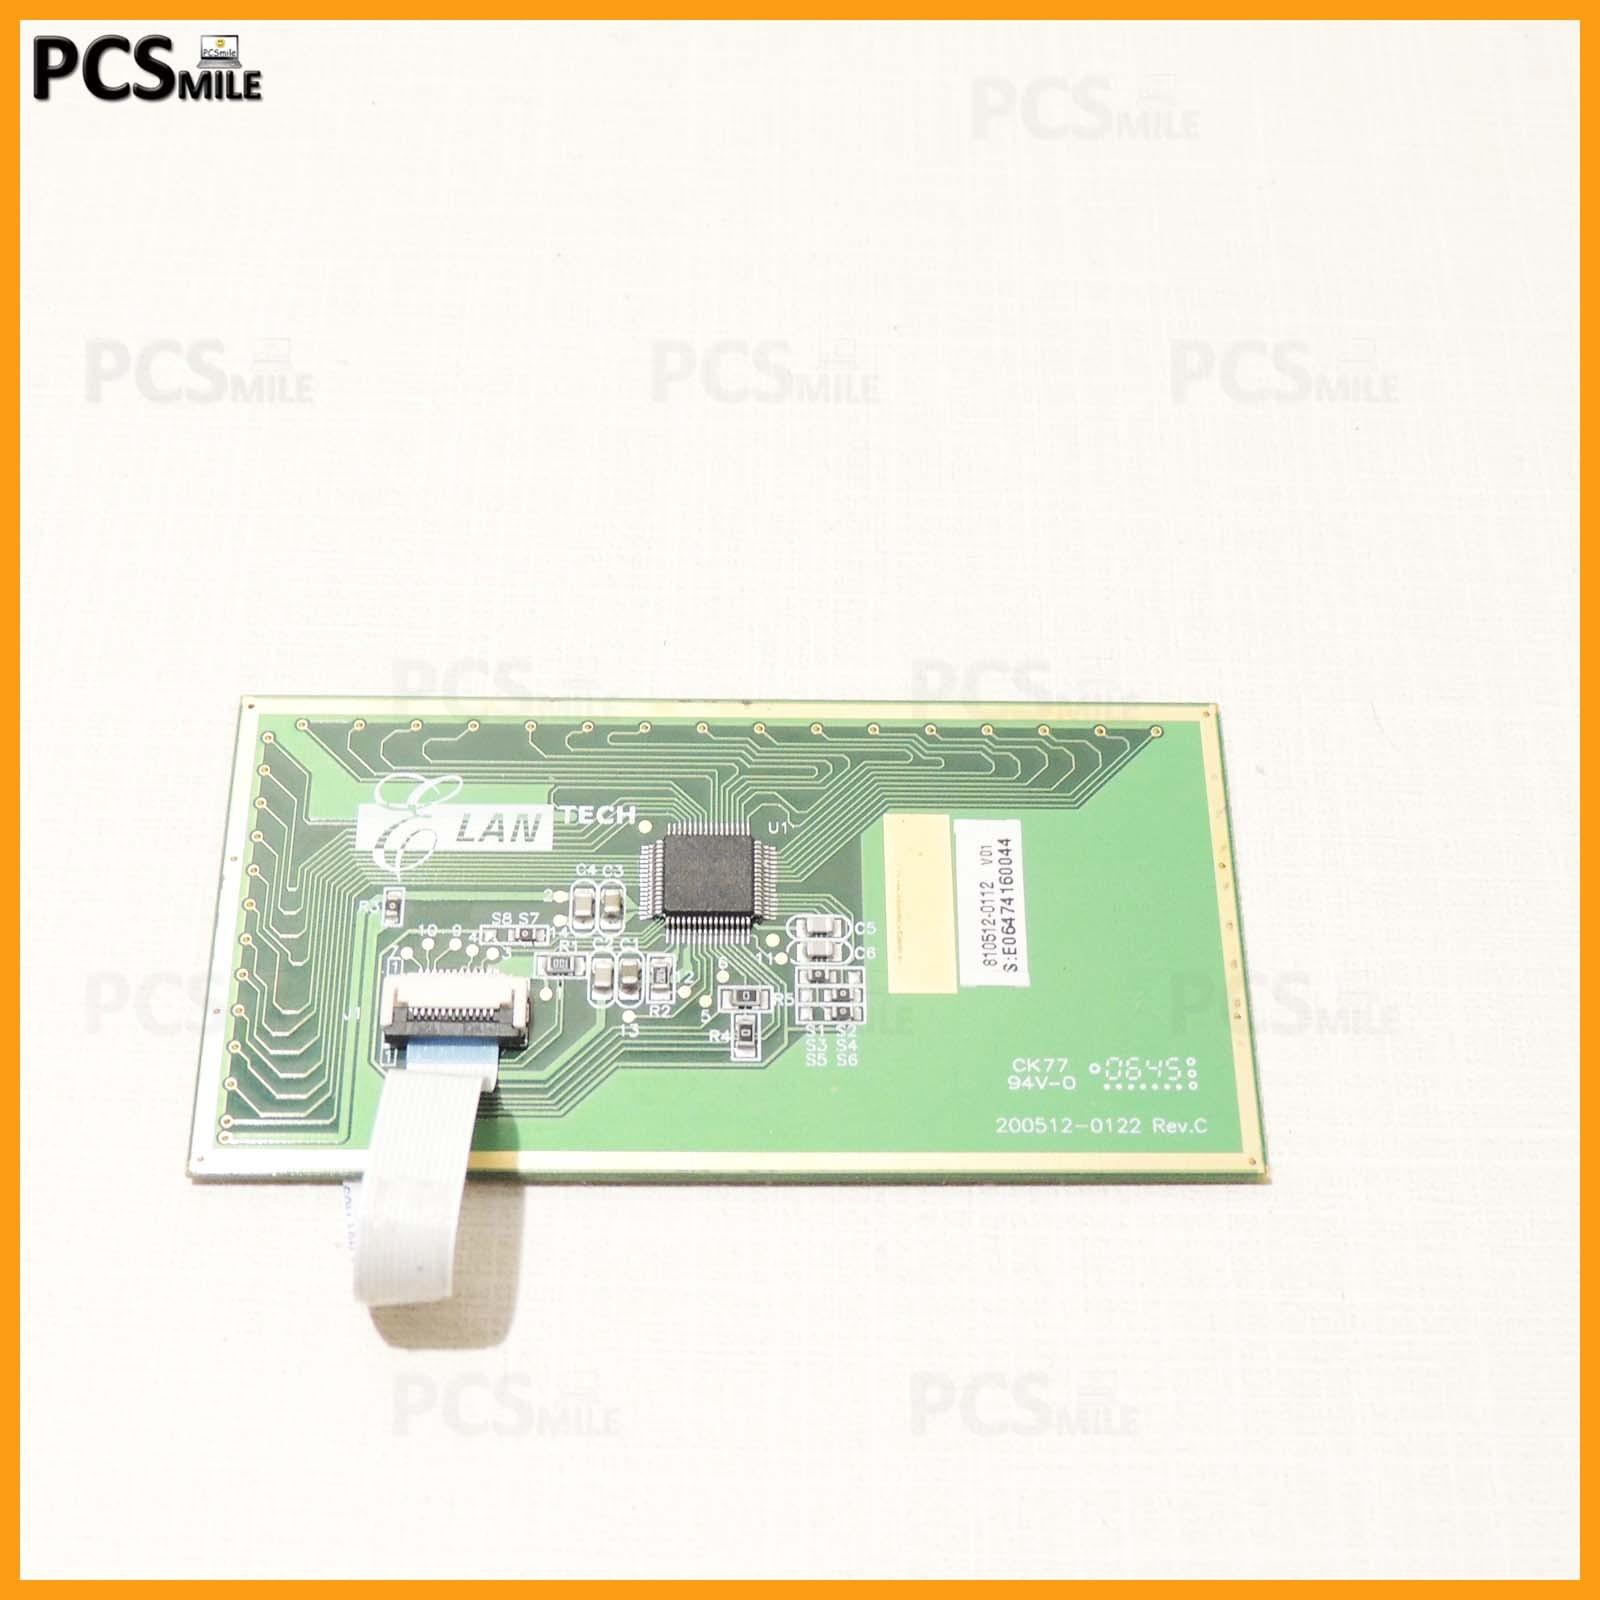 Touchpad Amilo Pi 1505 BS032 Fujitsu Siemens CK77 94V-0 0645 200512-0122 REV:C